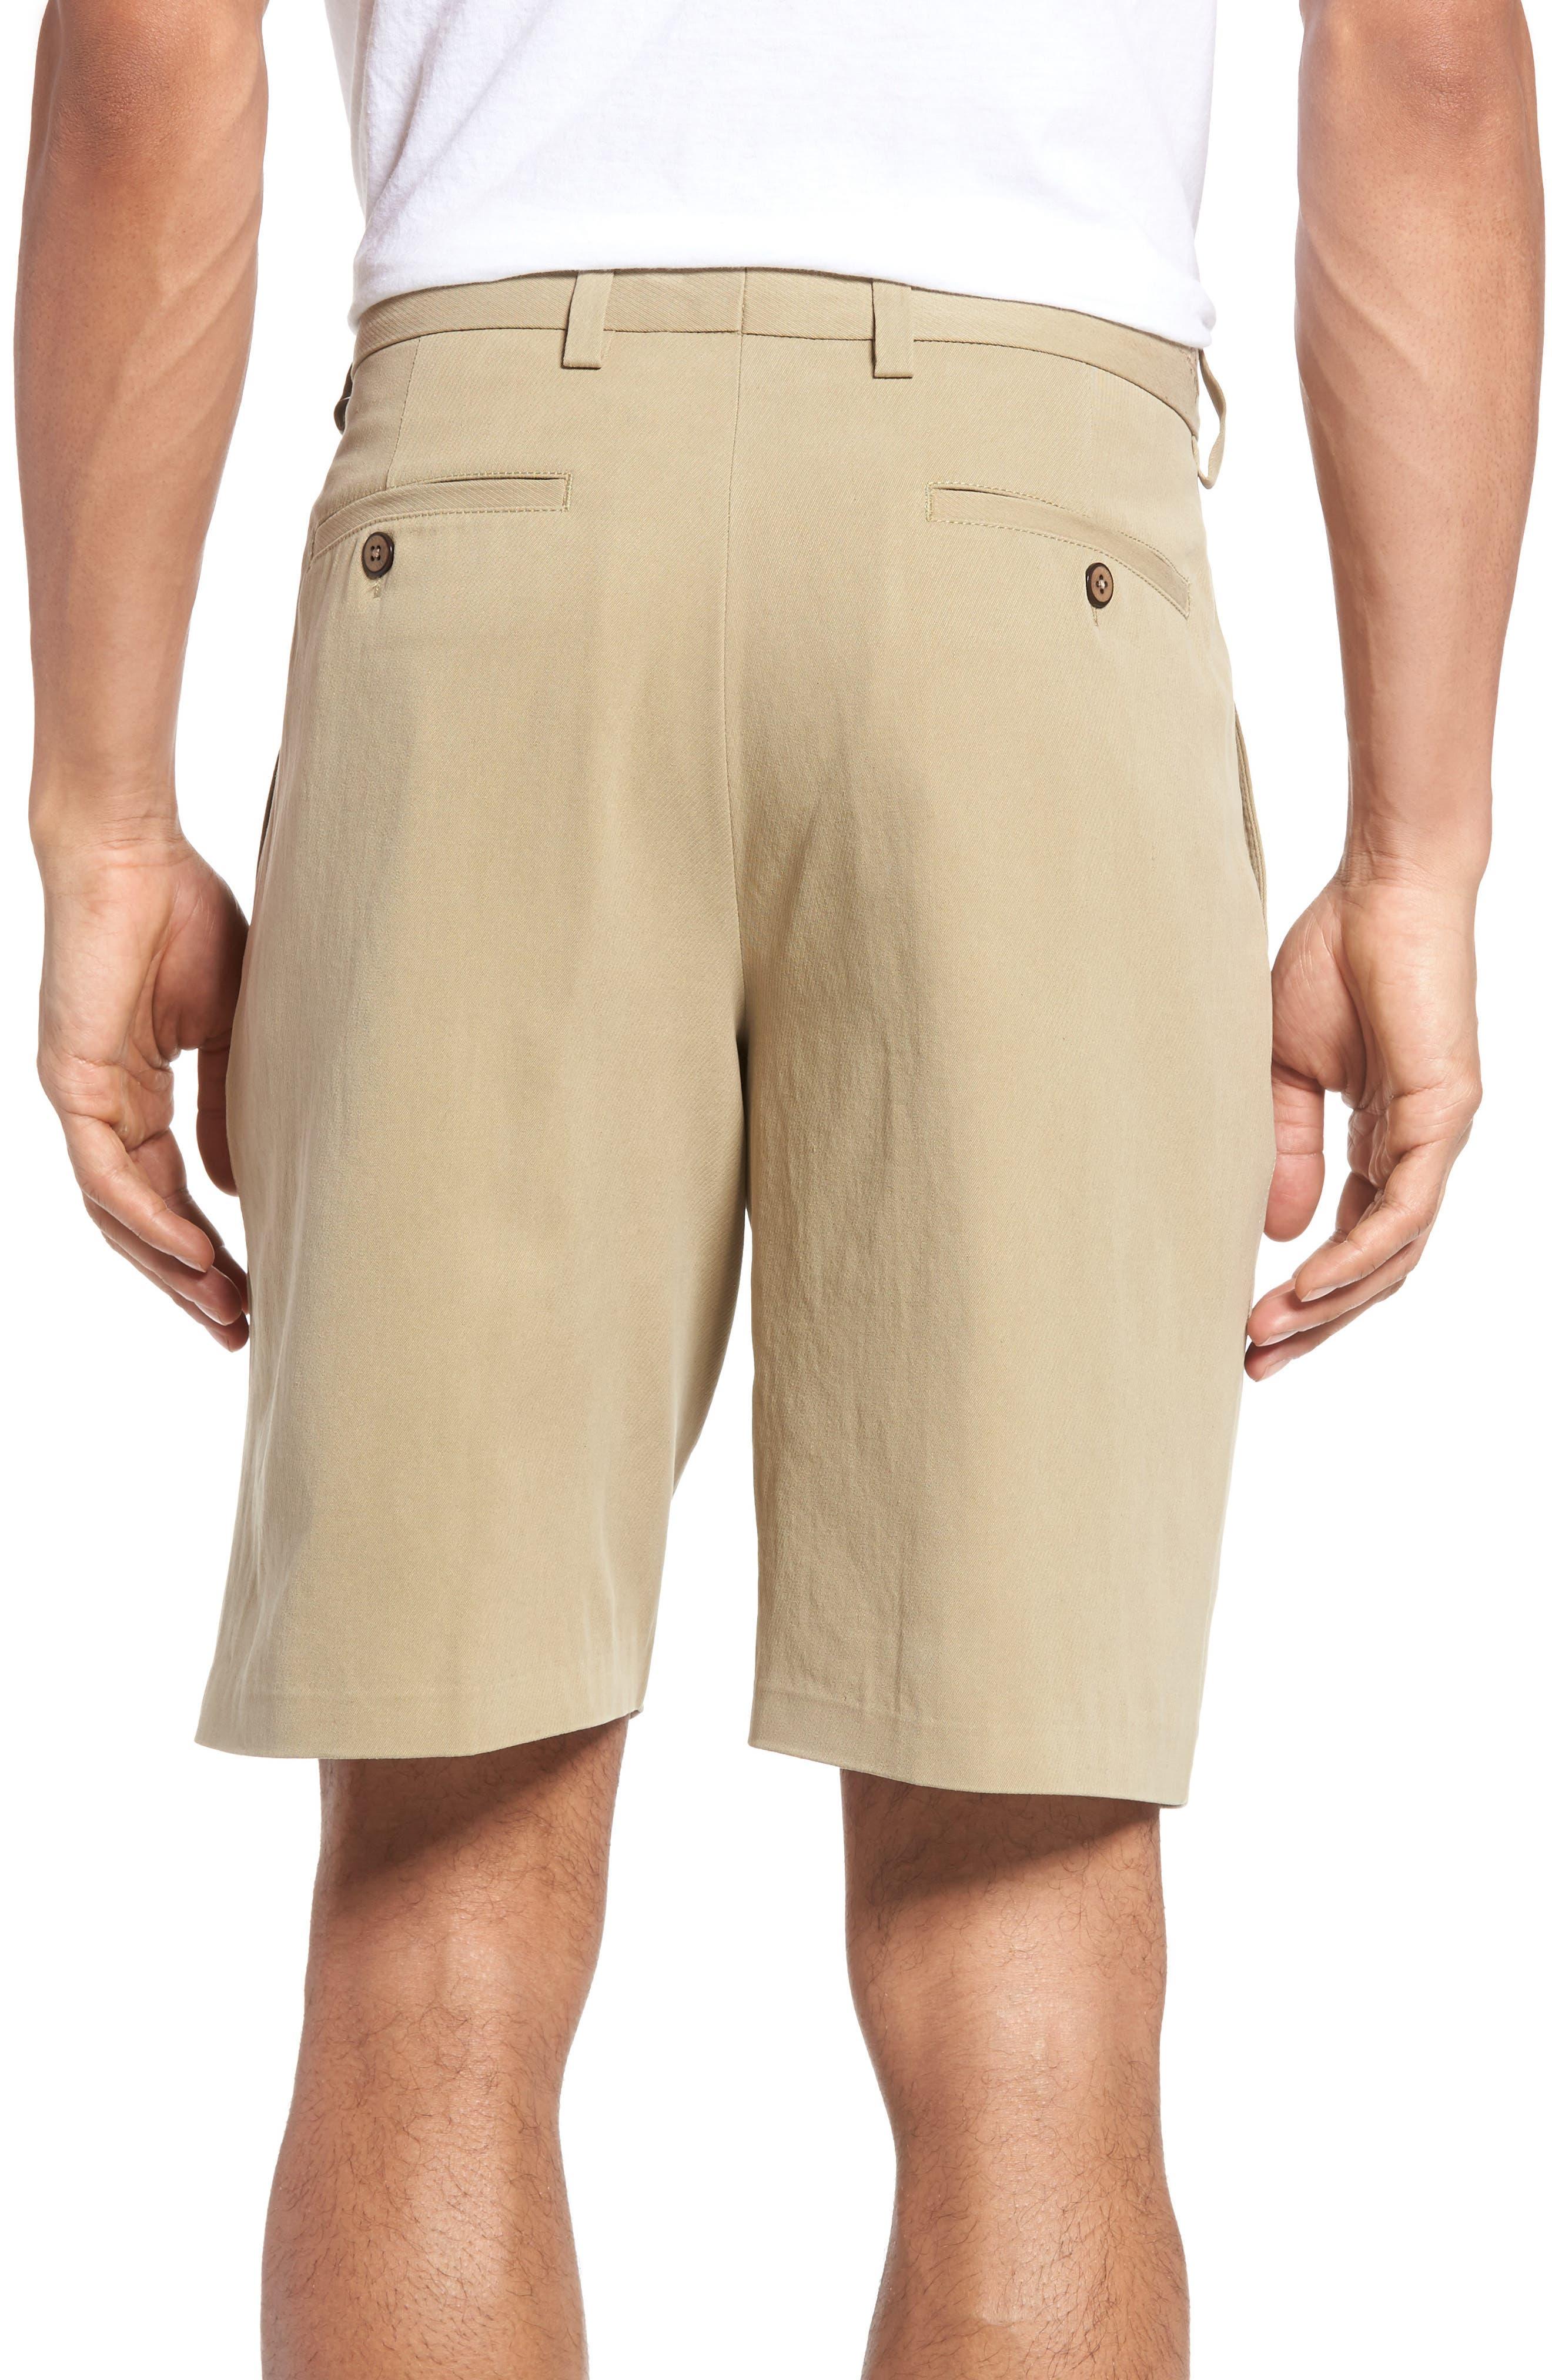 St. Thomas Pleated Shorts,                             Alternate thumbnail 12, color,